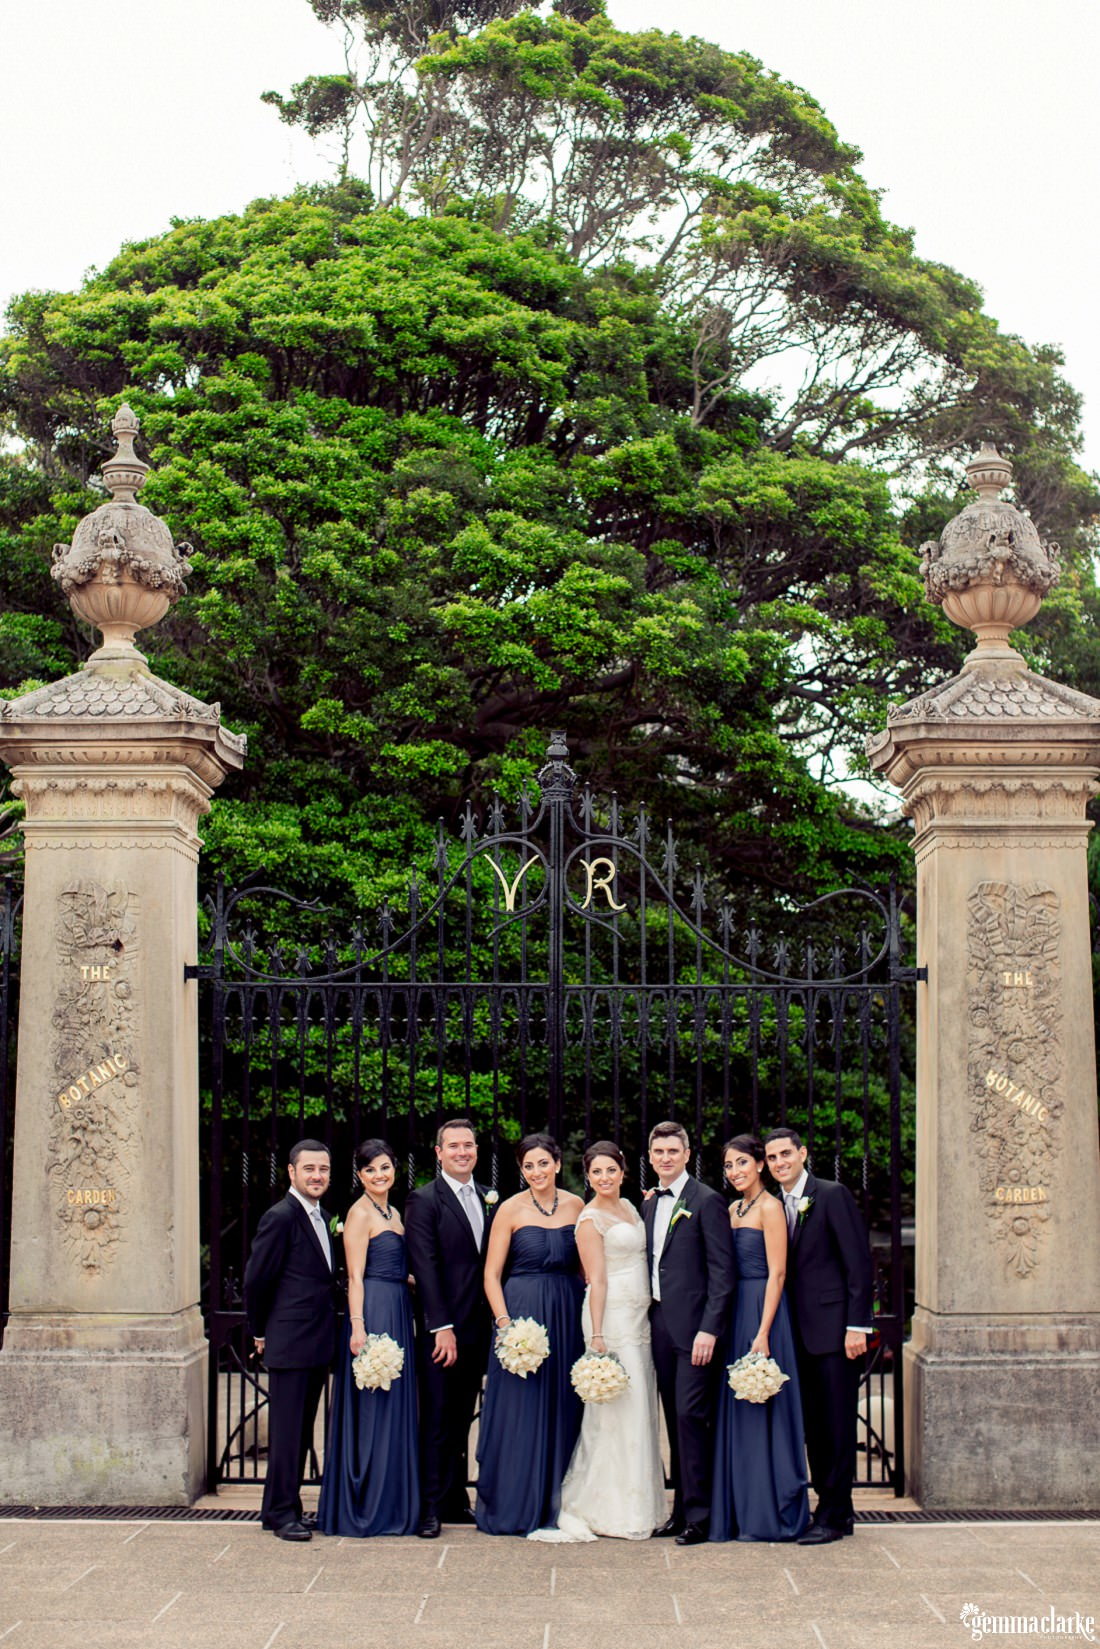 gemma-clarke-photography_botanic-gardens-wedding-reception_amanda-and-dylan_0040